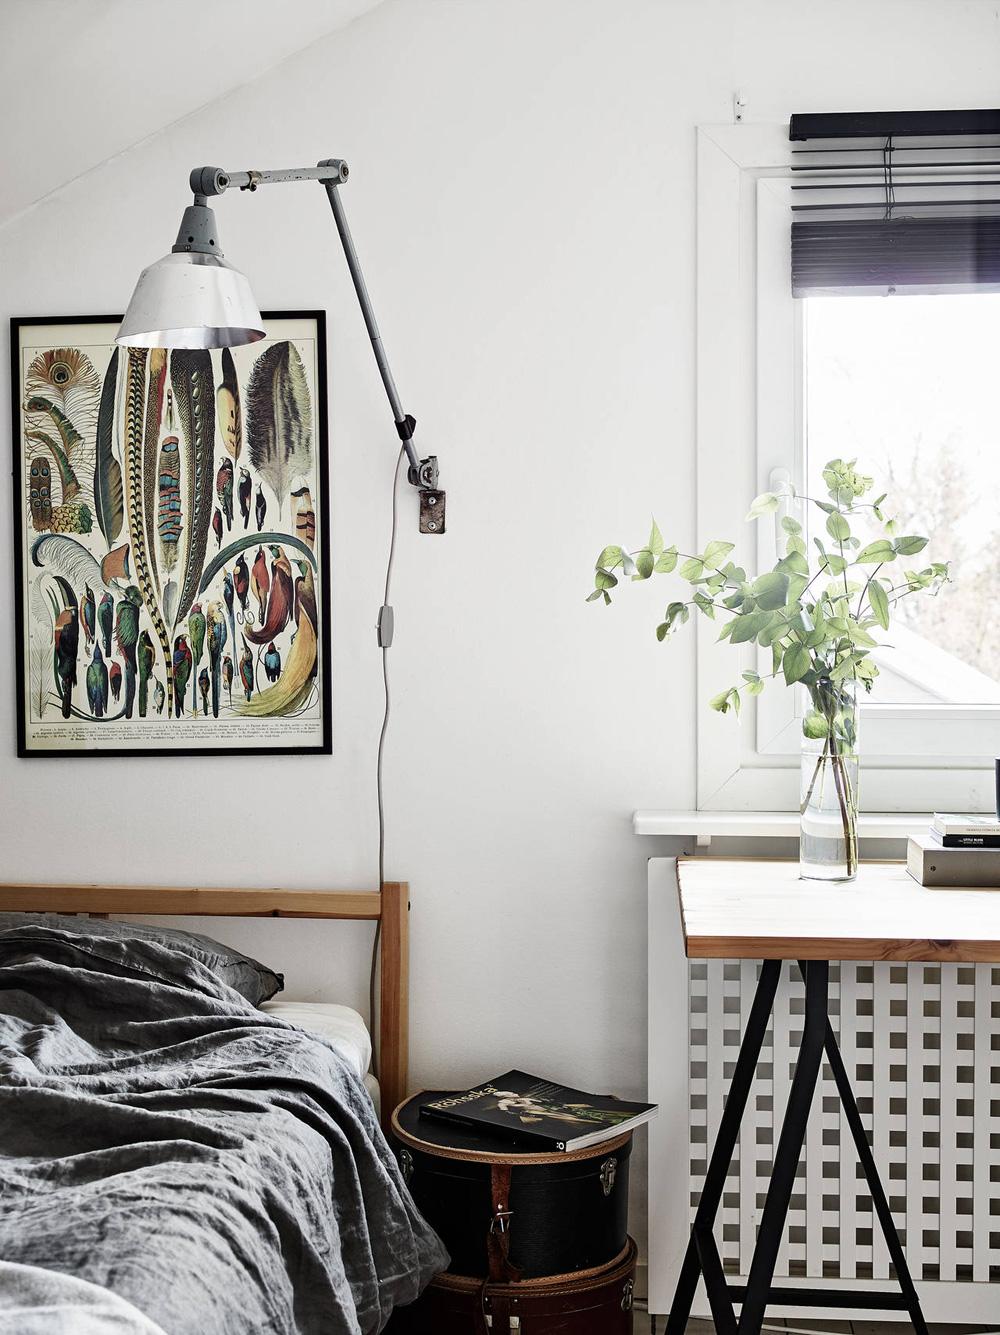 Oracle-Fox-Sunday-Sanctuary-Elsewhere-Small-Apartment-living-Alternative-Scandinvian-Interior-15